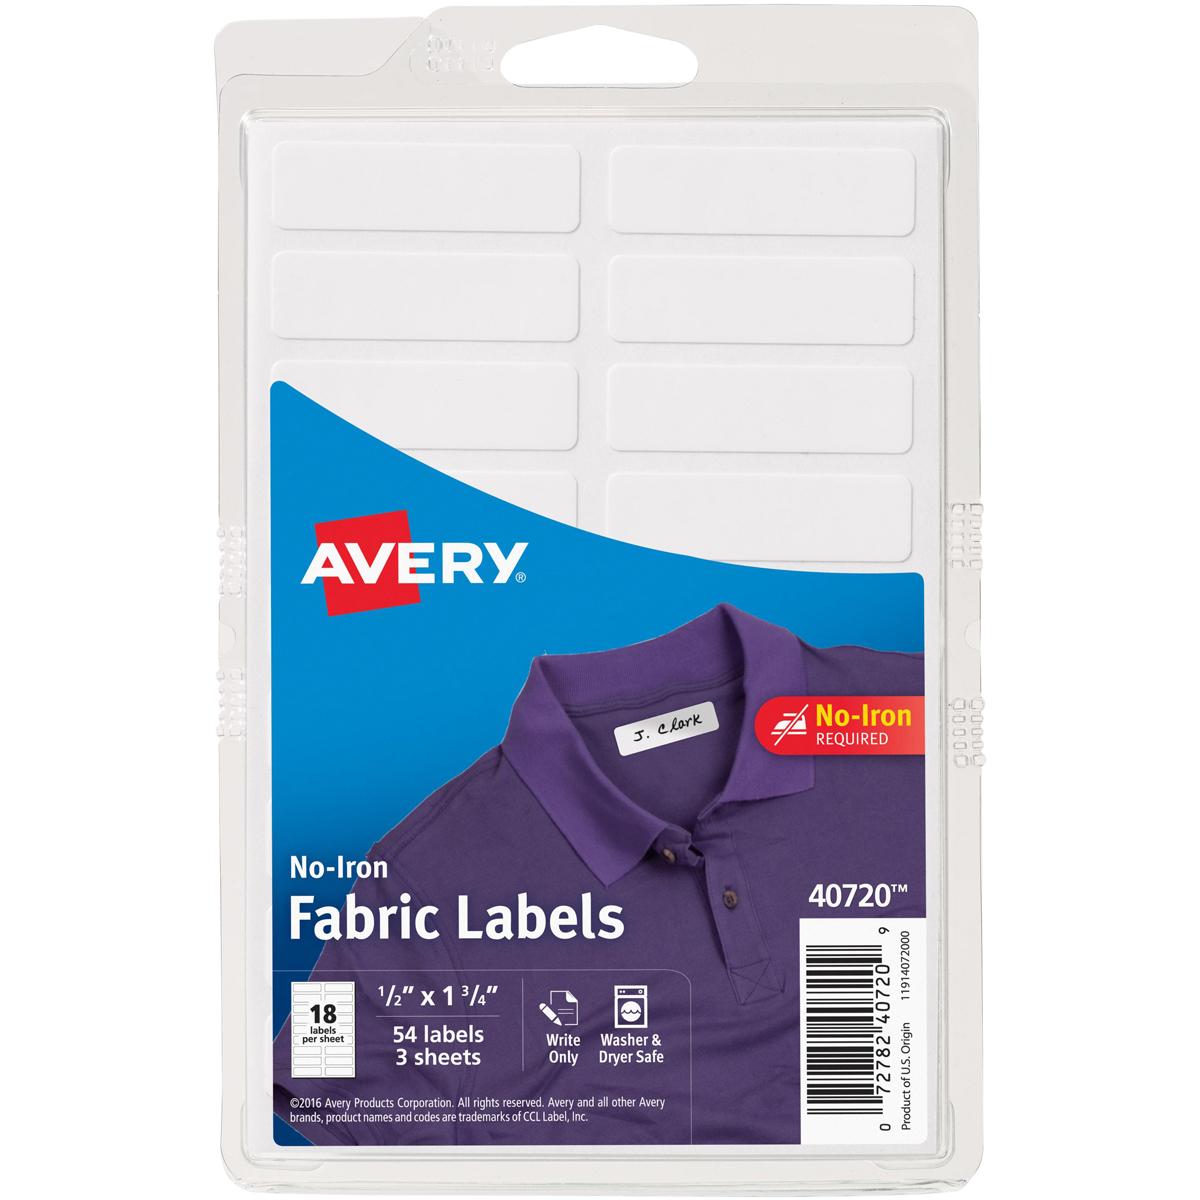 No-Iron Handwrite Fabric Labels 3 Sheets-White